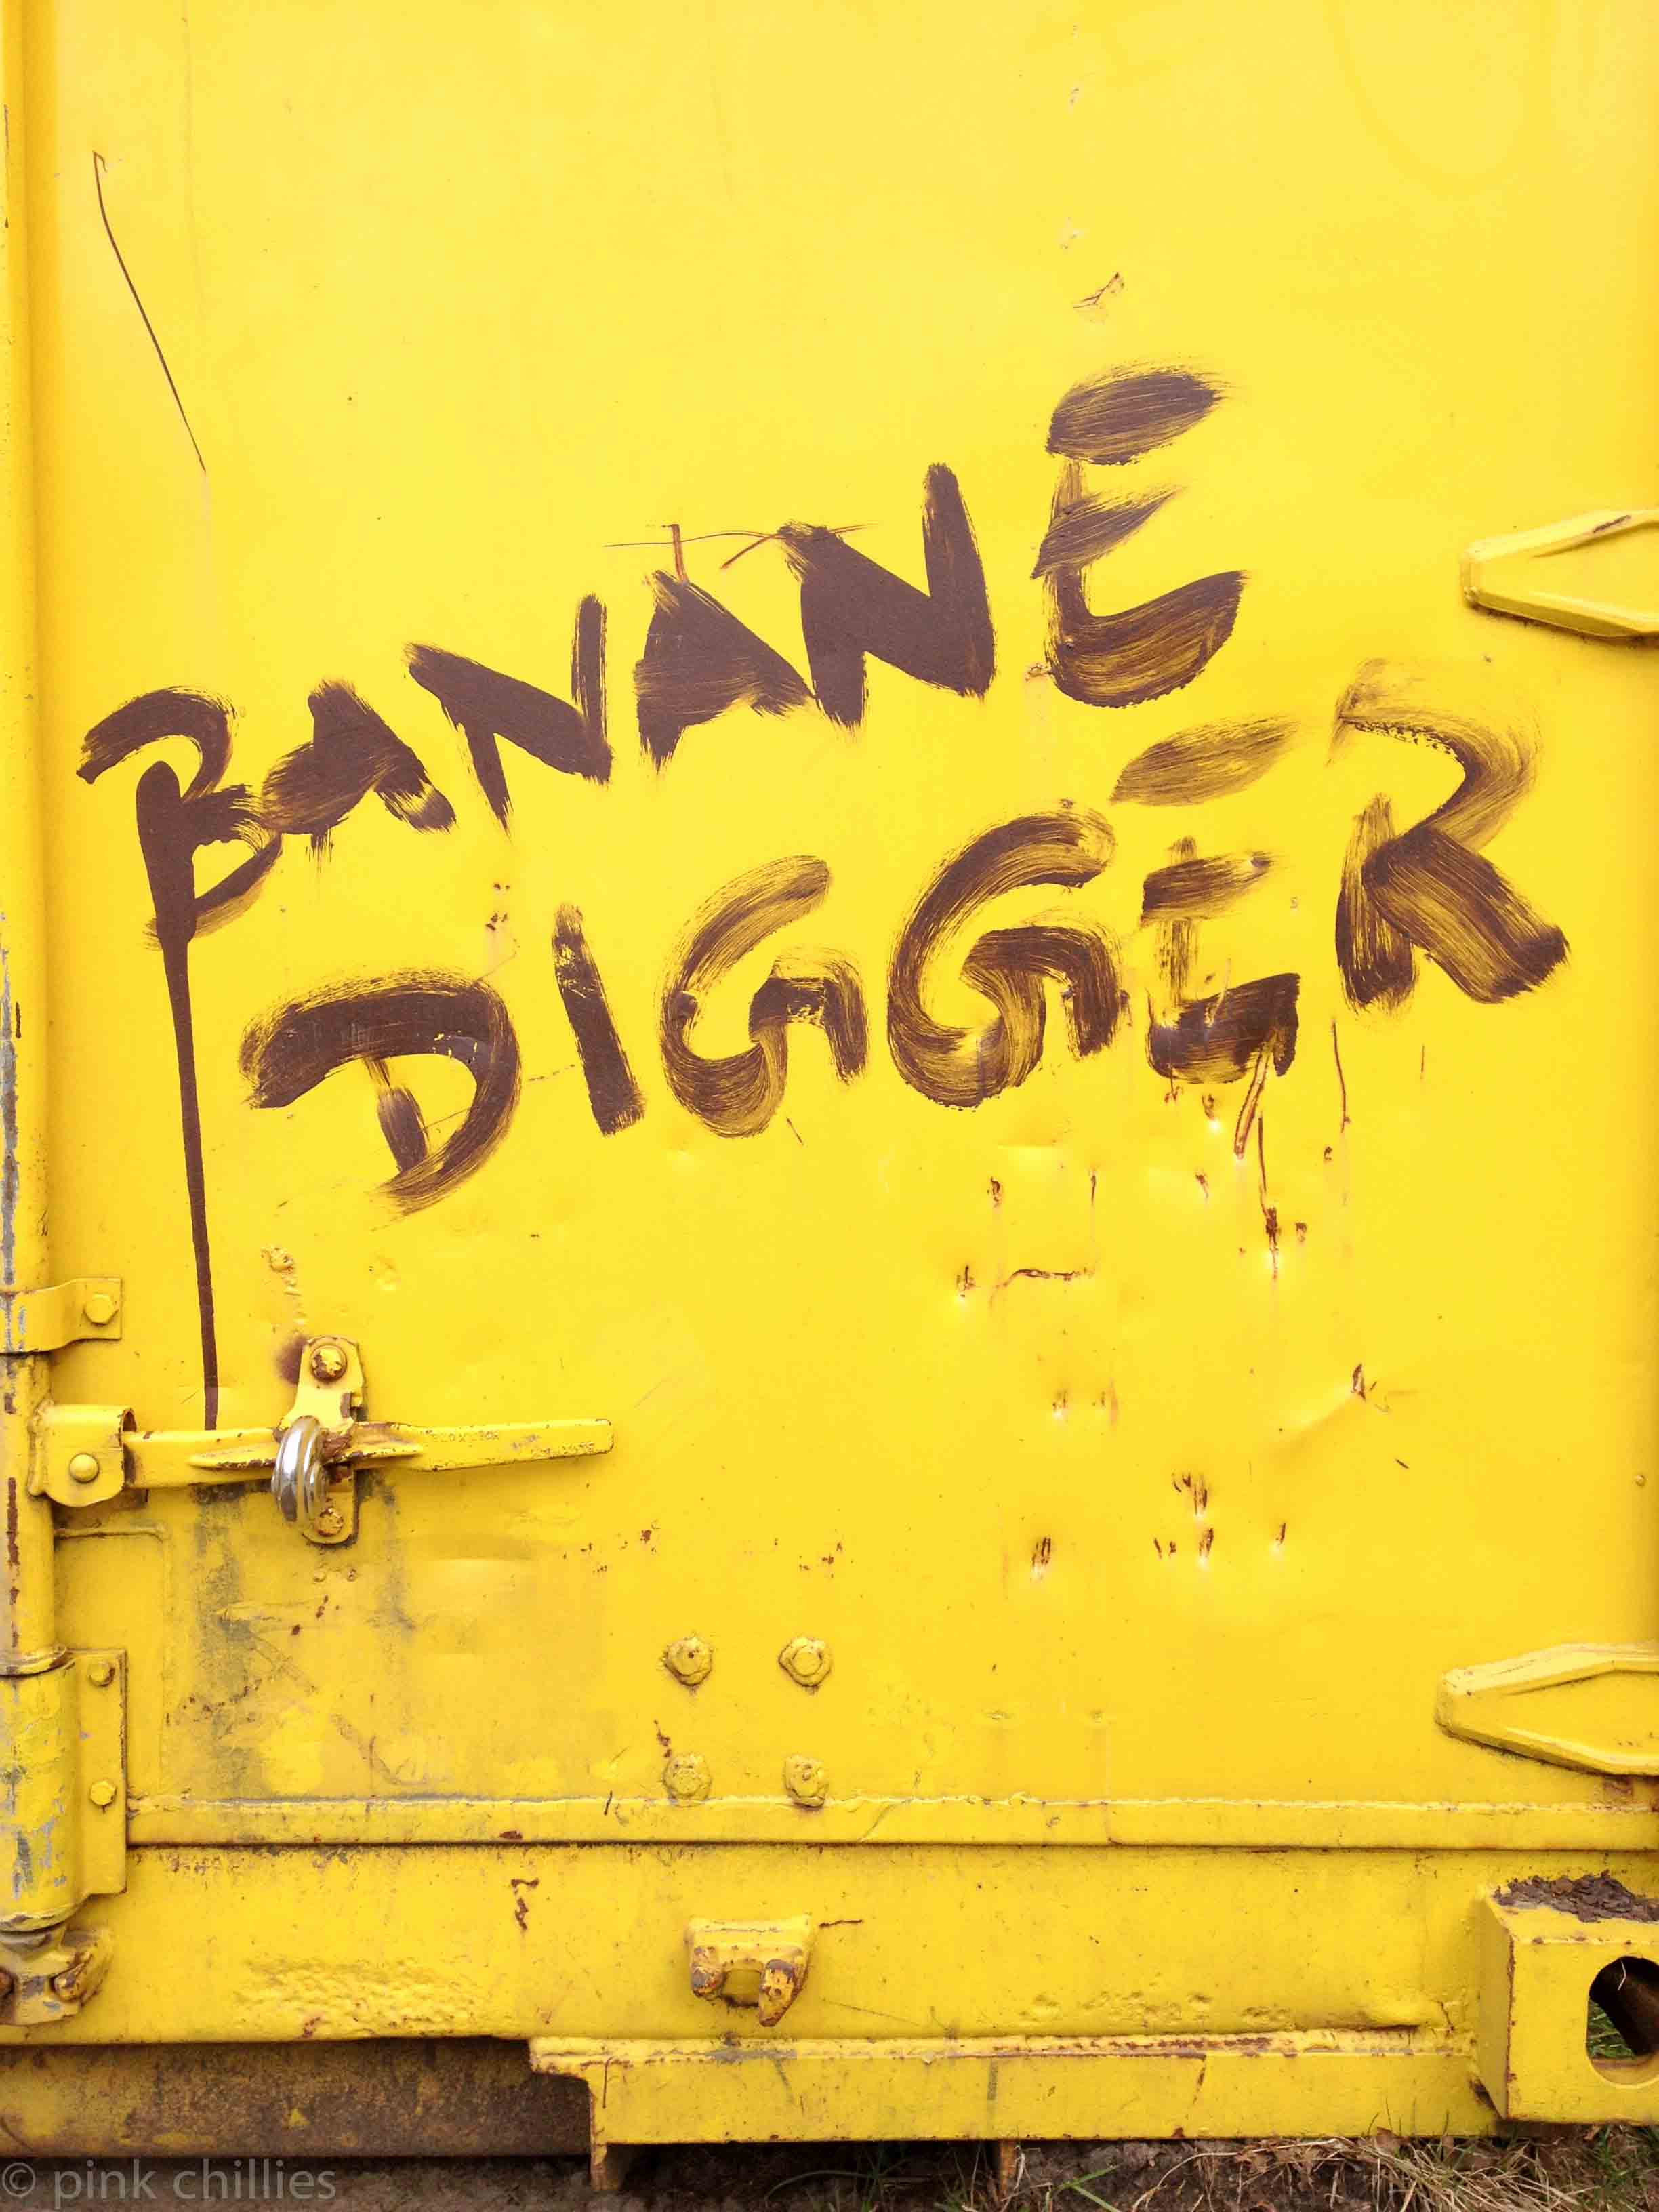 Banane Digger